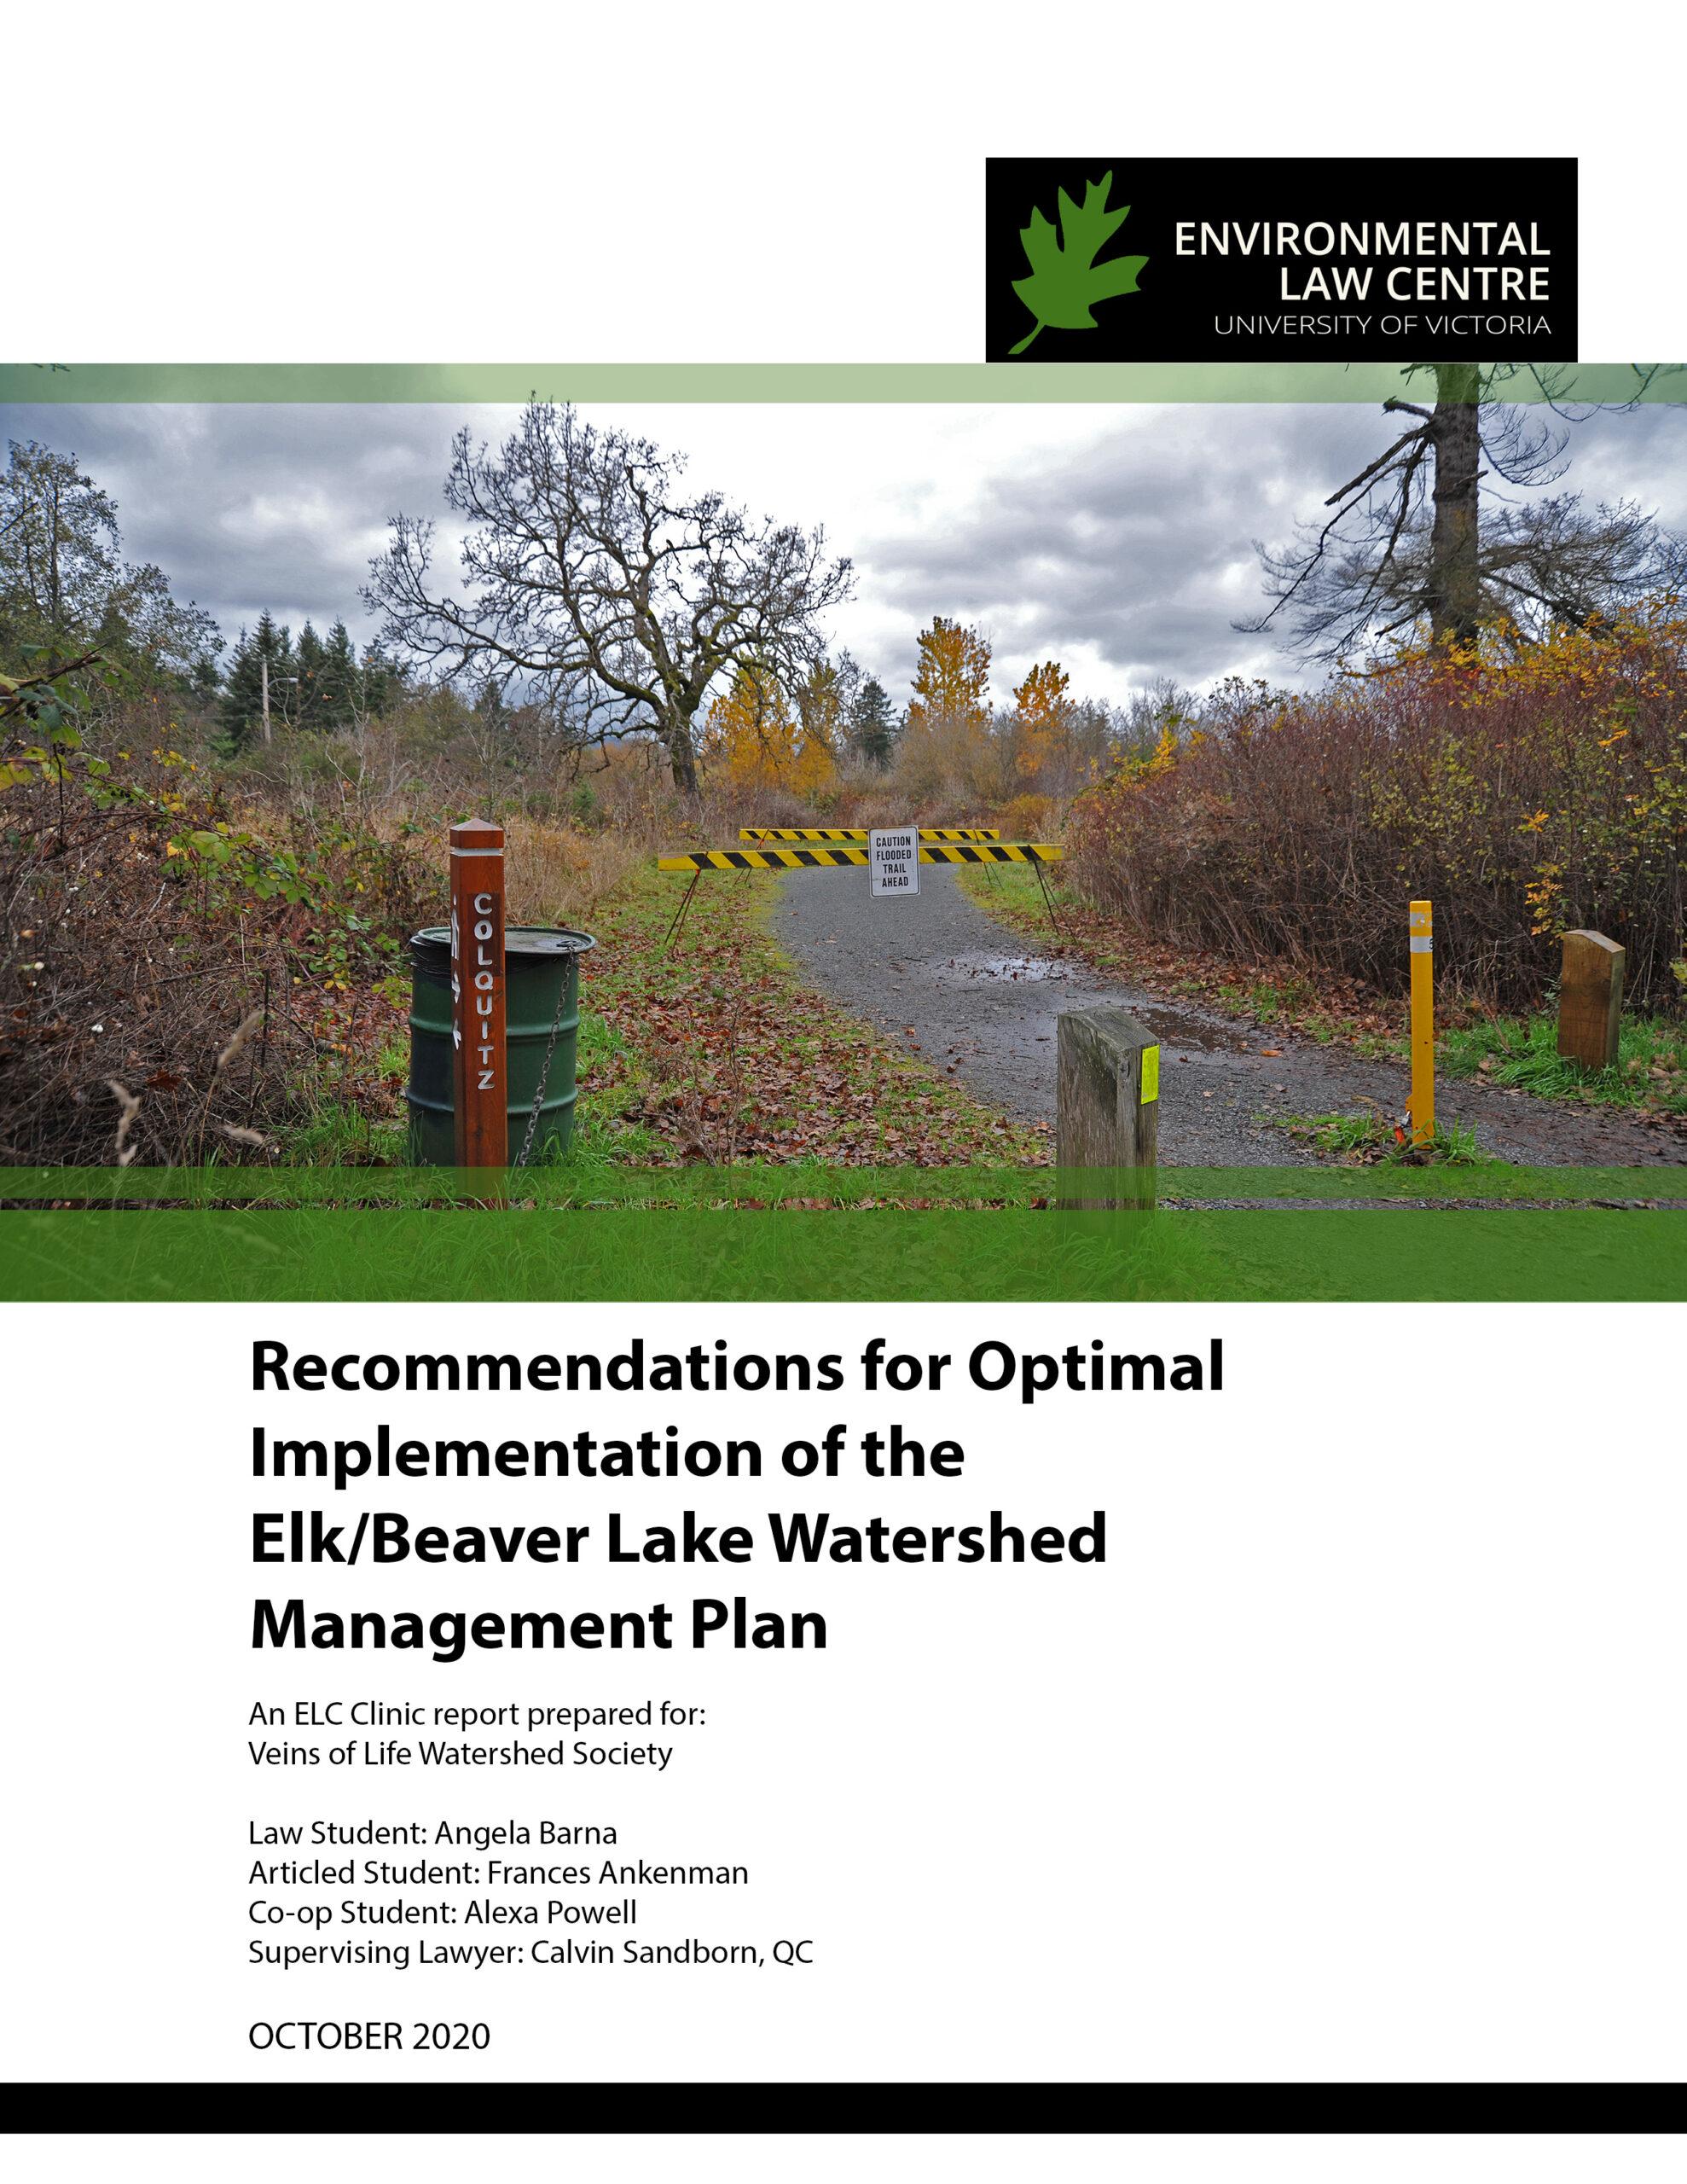 Elk Beaver Lake Management